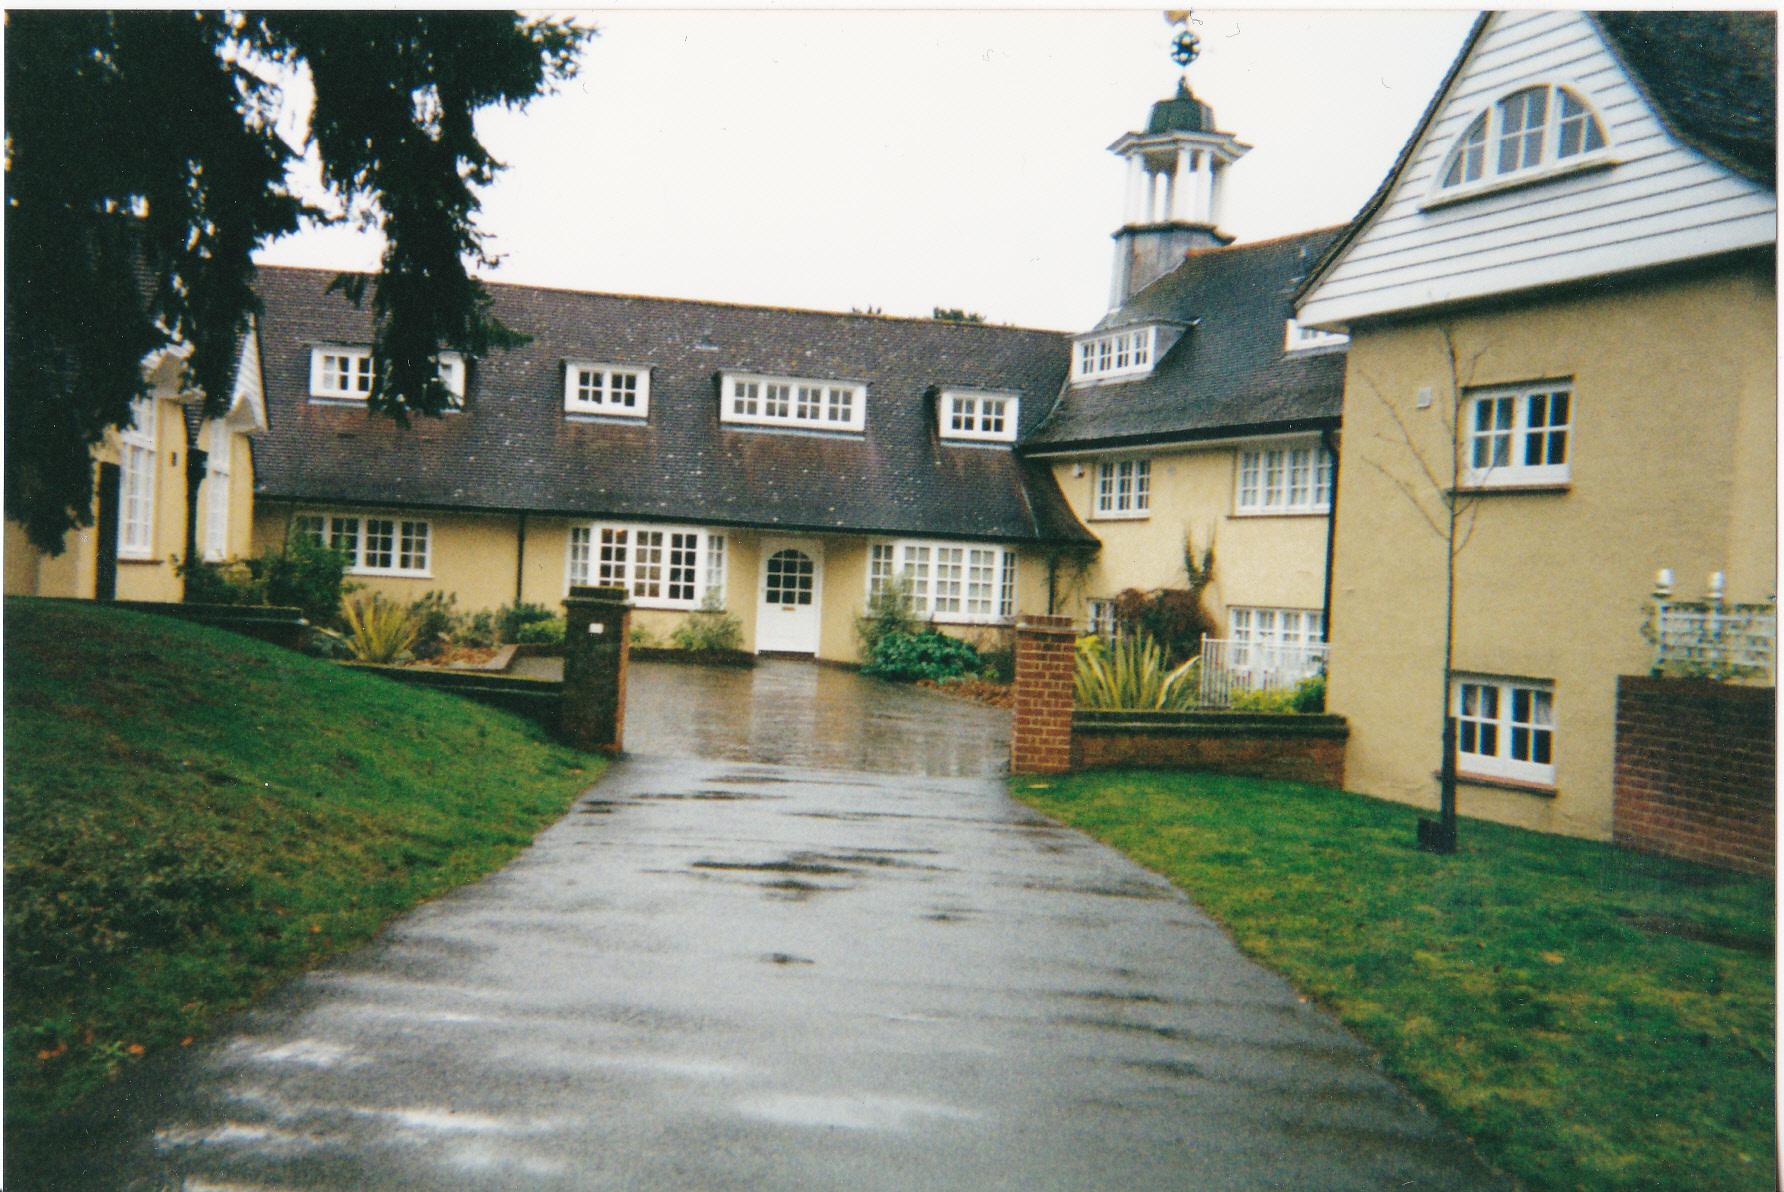 A corner of the former East Anglian Sanatorium